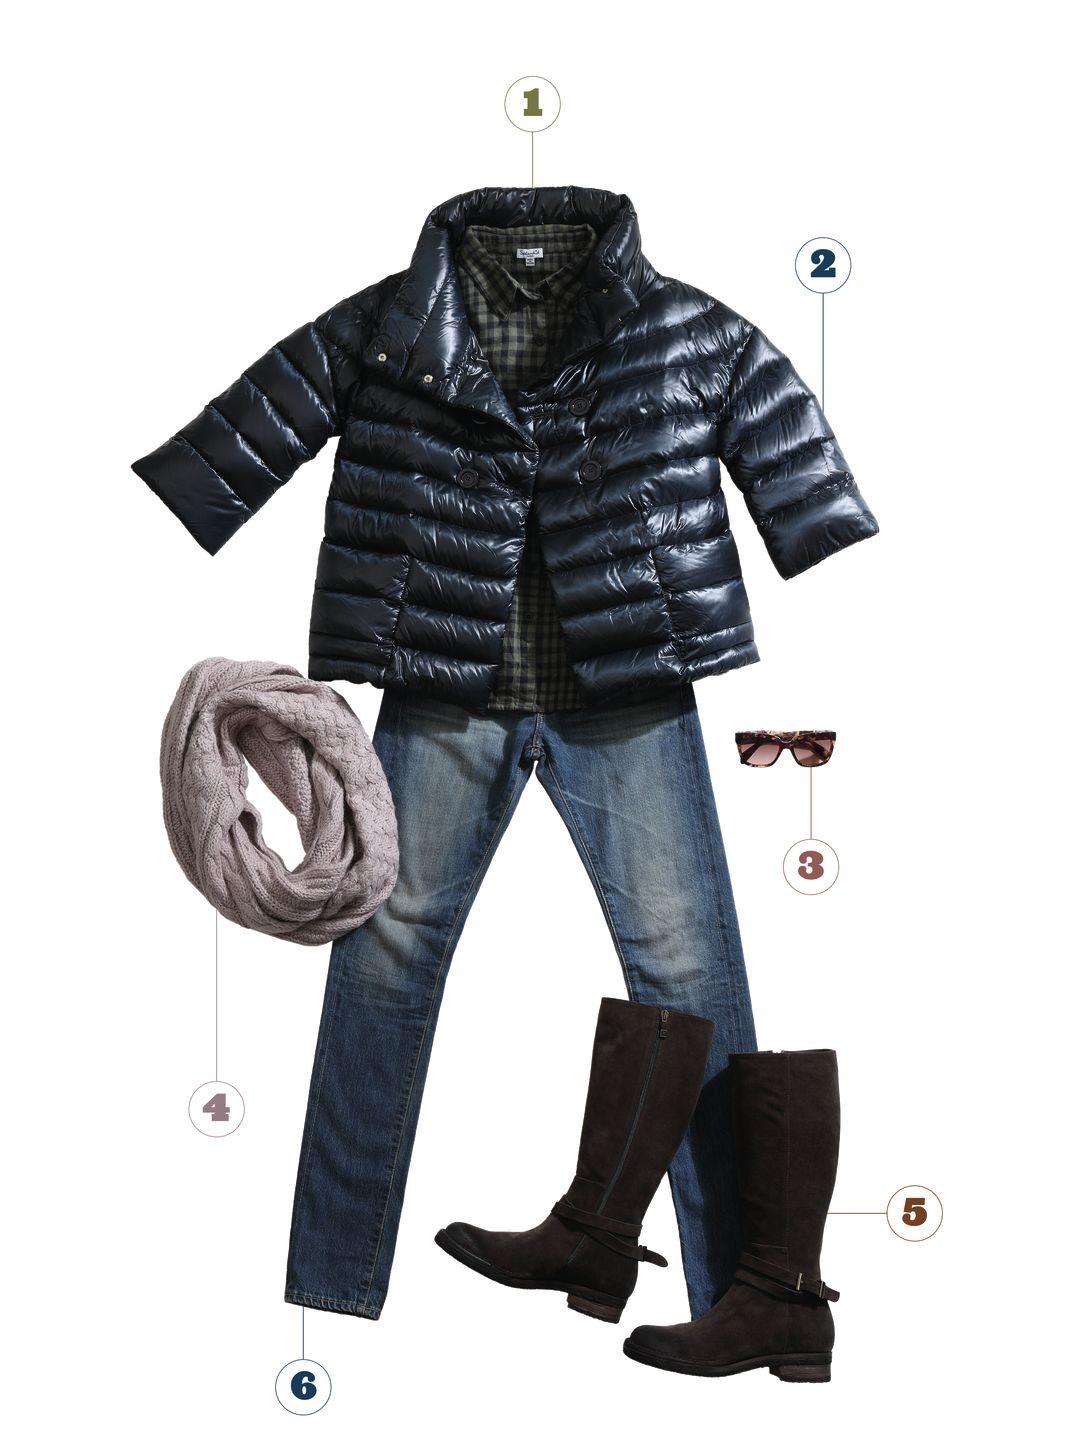 Pcwi 16 wardrobe blue jean baby m2drz7